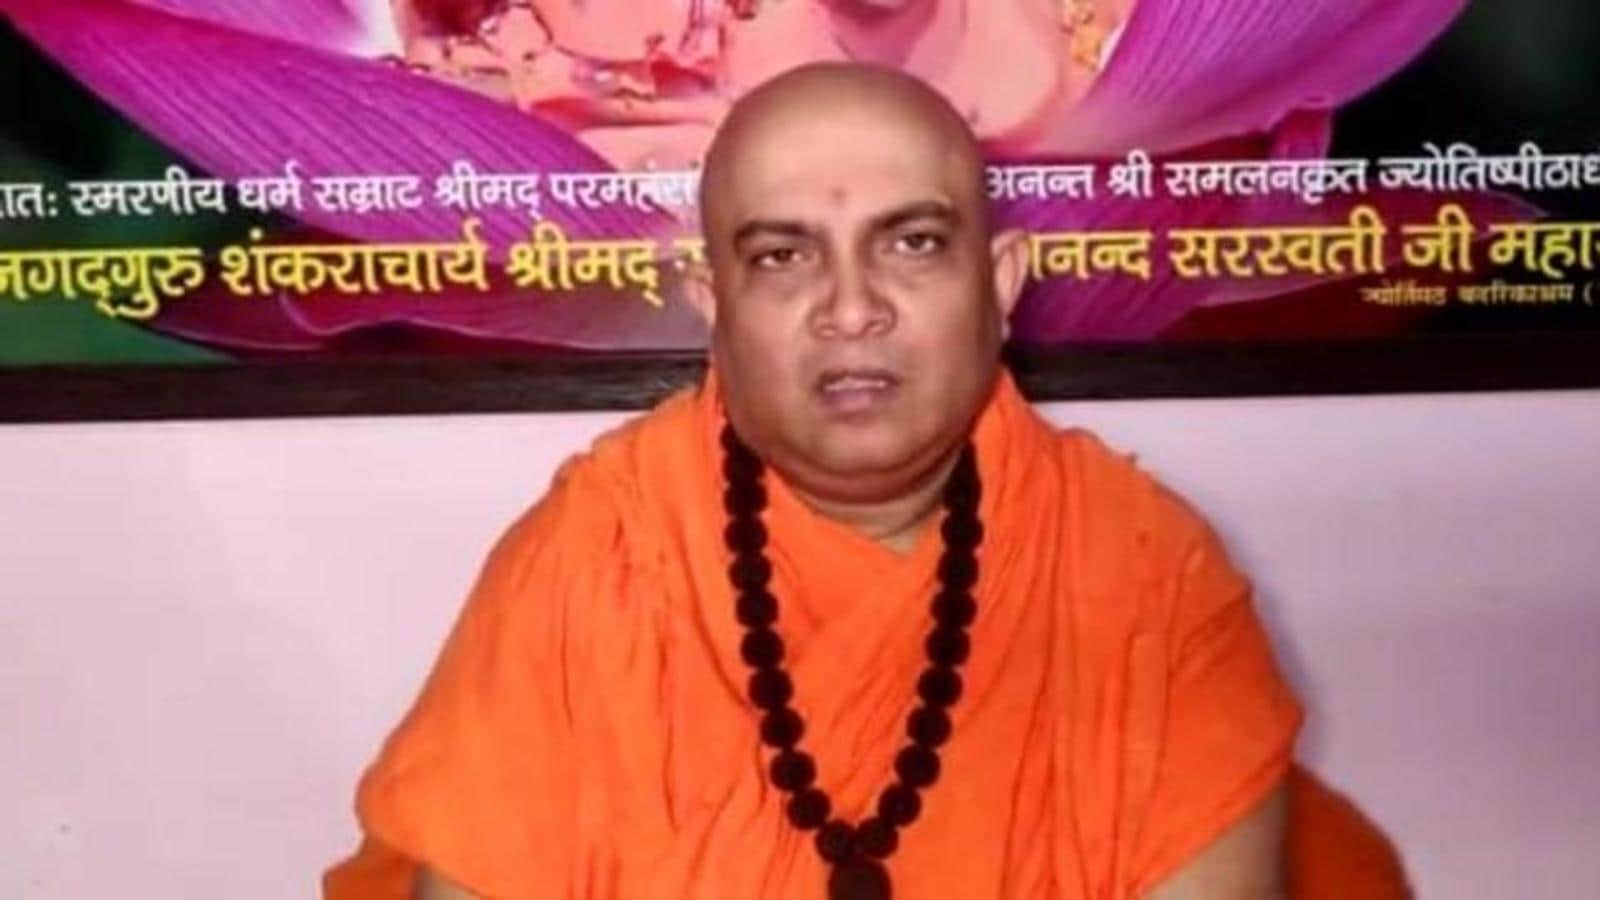 Akhil Bharatiya Sant Samiti demands probe into Narendra Giri's death